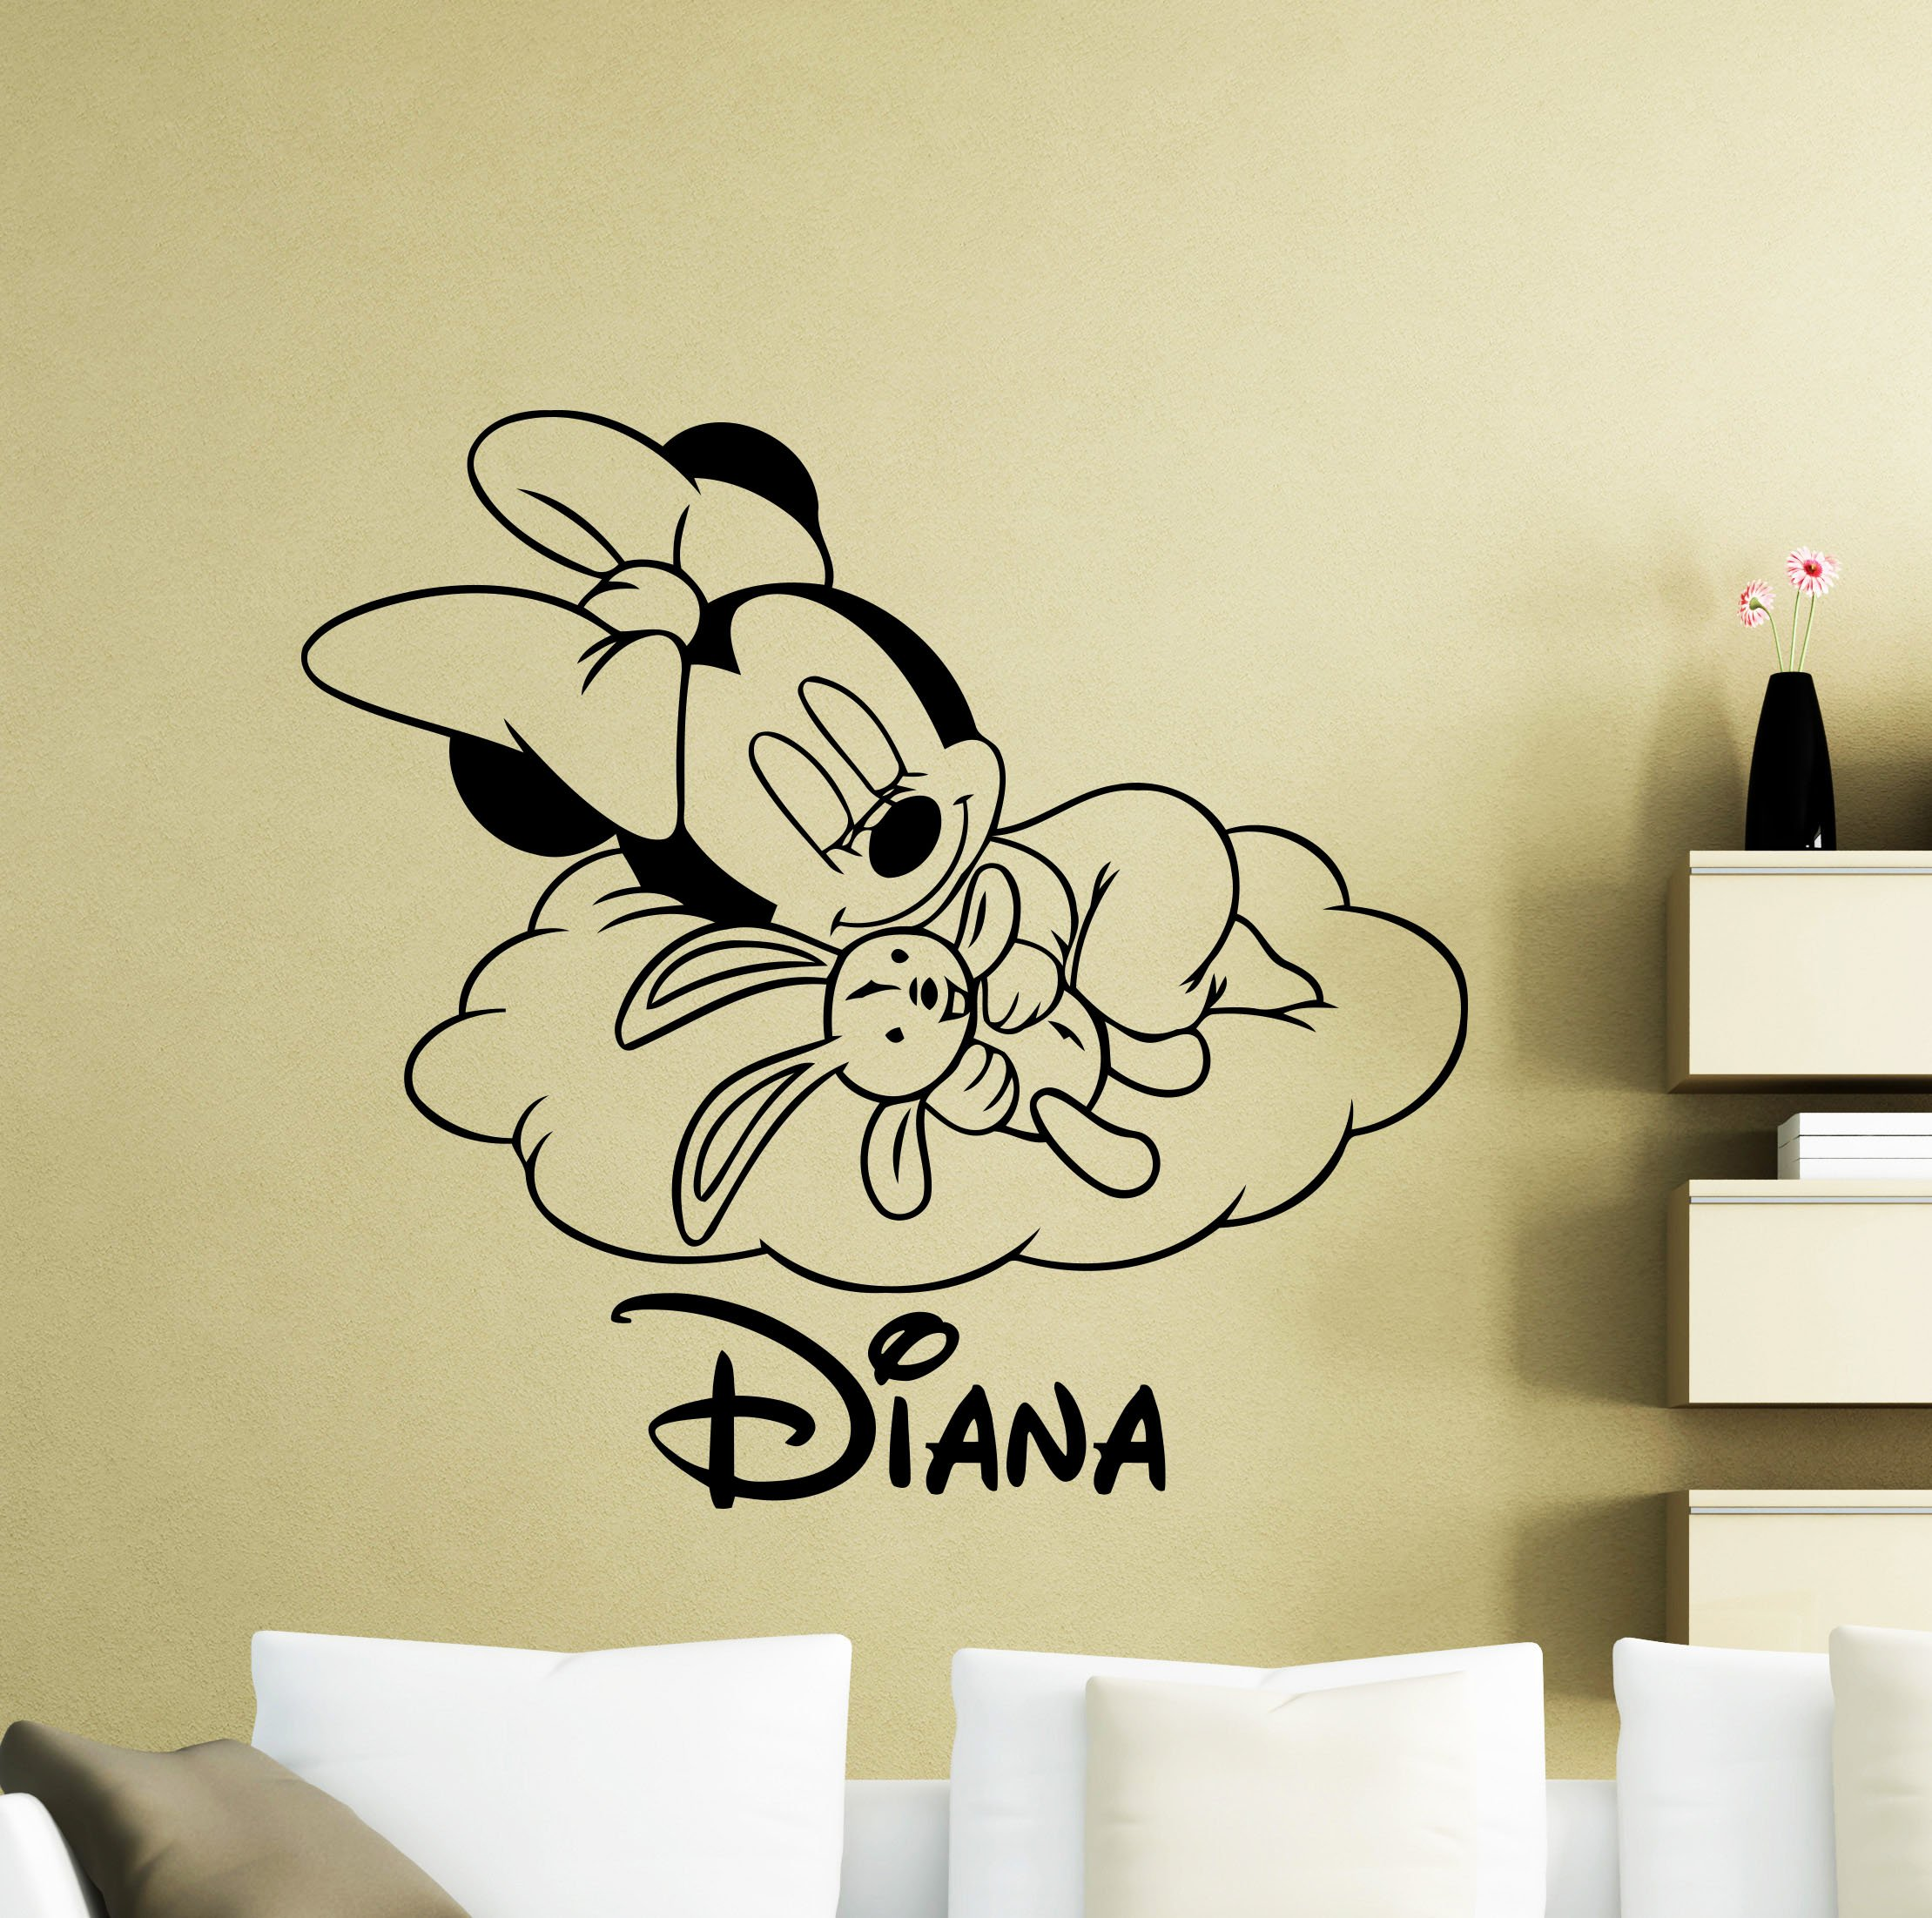 Personalized Minnie Mouse Wall Decal Sleepng On Cloud Nursery Custom Baby Name Cartoon Disney Vinyl Sticker Personal Home Nursery Room Interior Art Decor Kids Girl Boy Room Mural Vinyl Sticker 30me